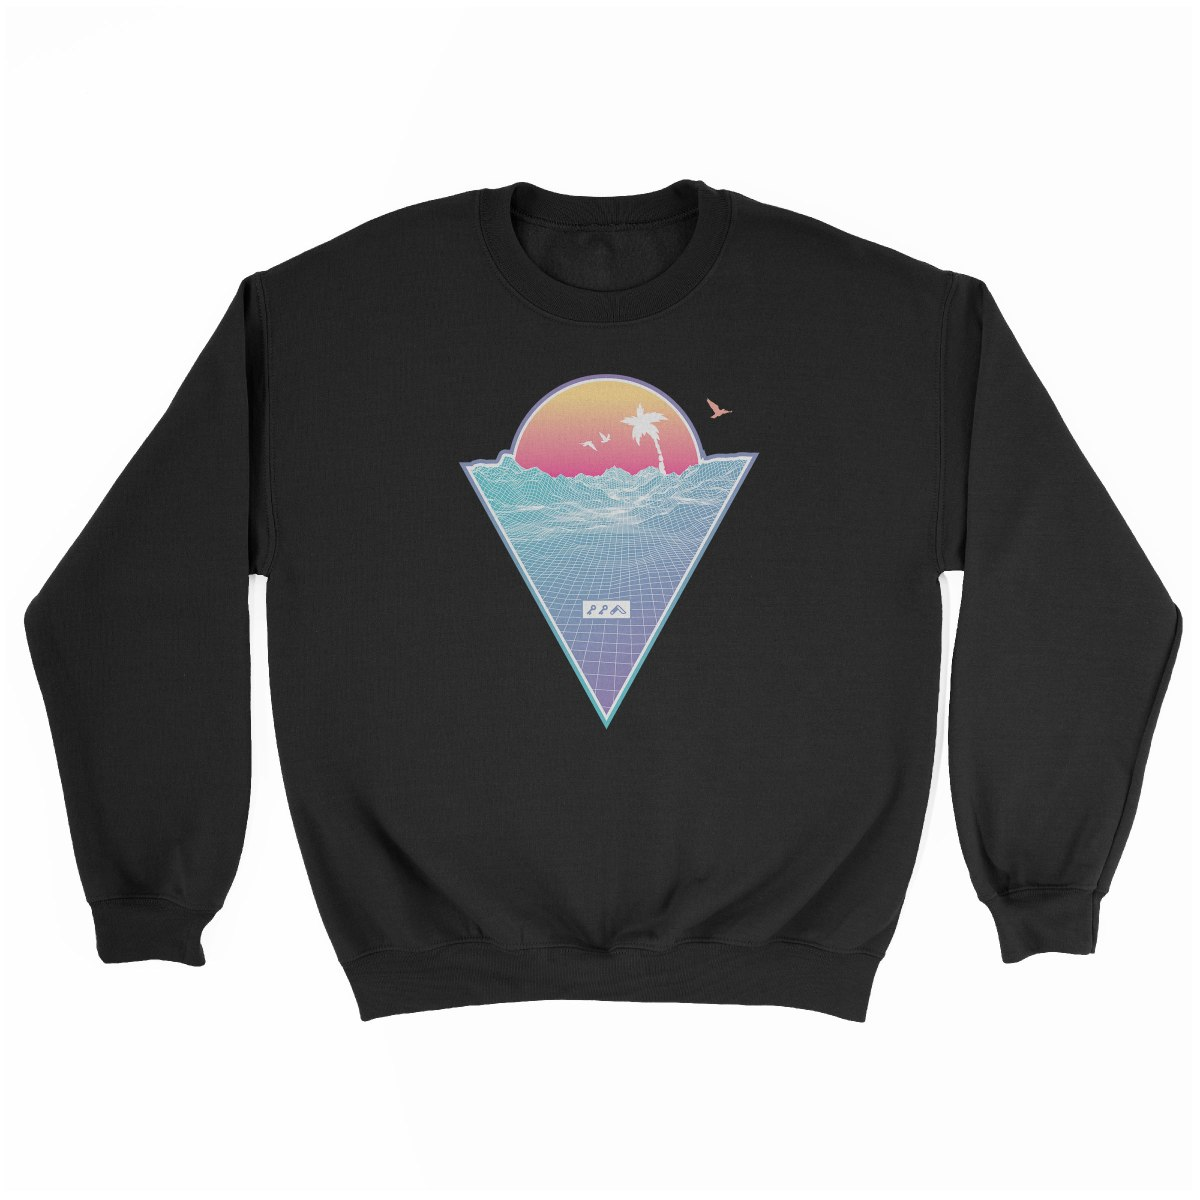 """OFF THE GRID"" cali vibes retro 80s design sweatshirt black at kikicutt.com"